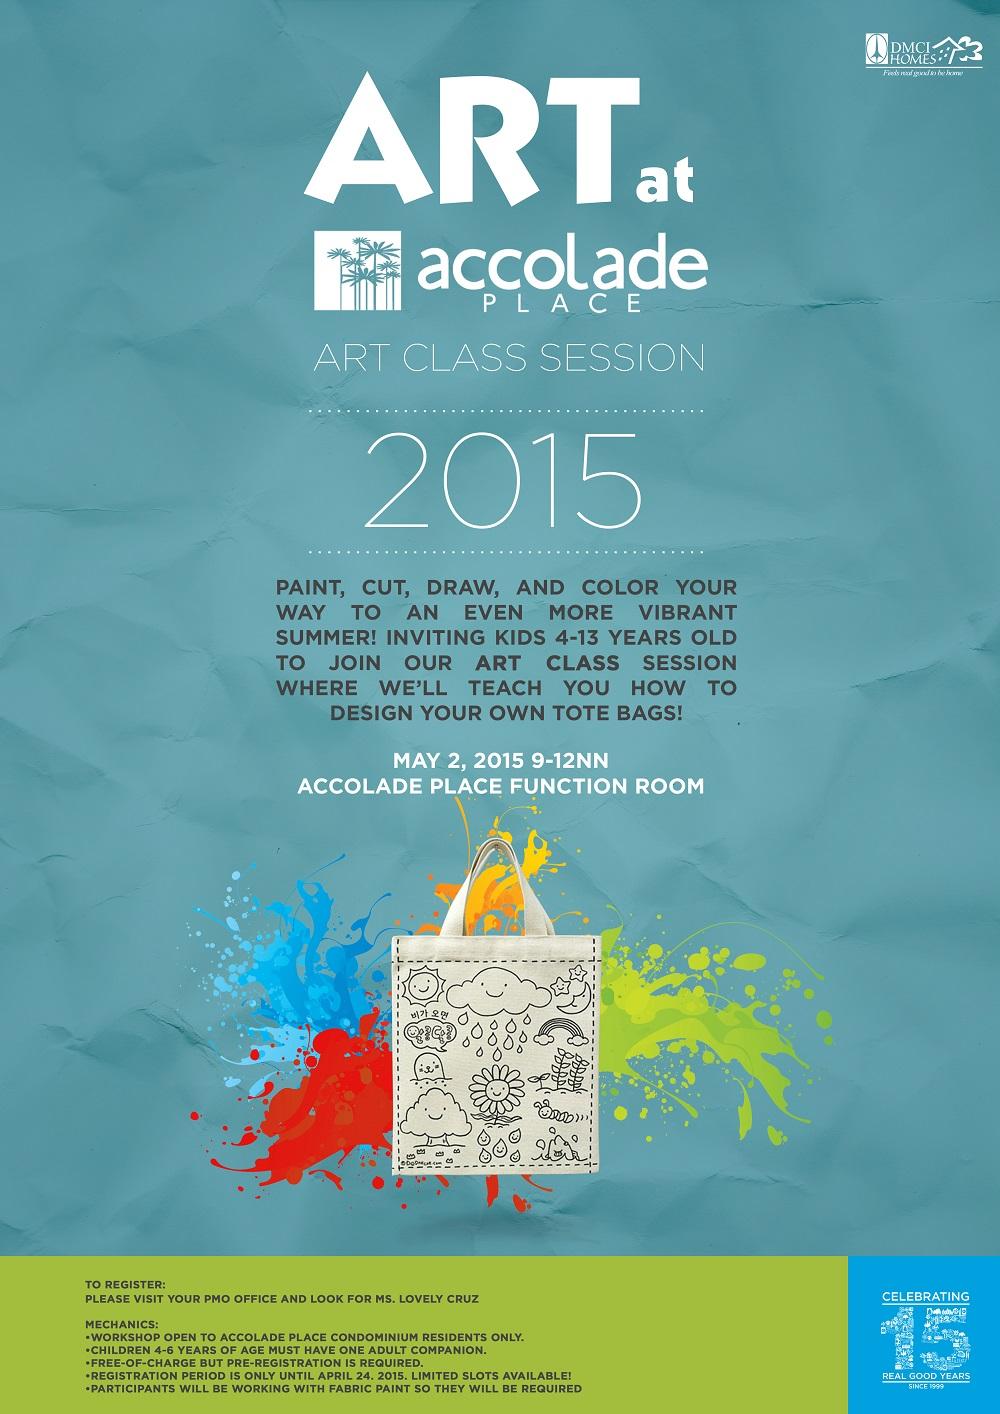 ART At Accolade Place